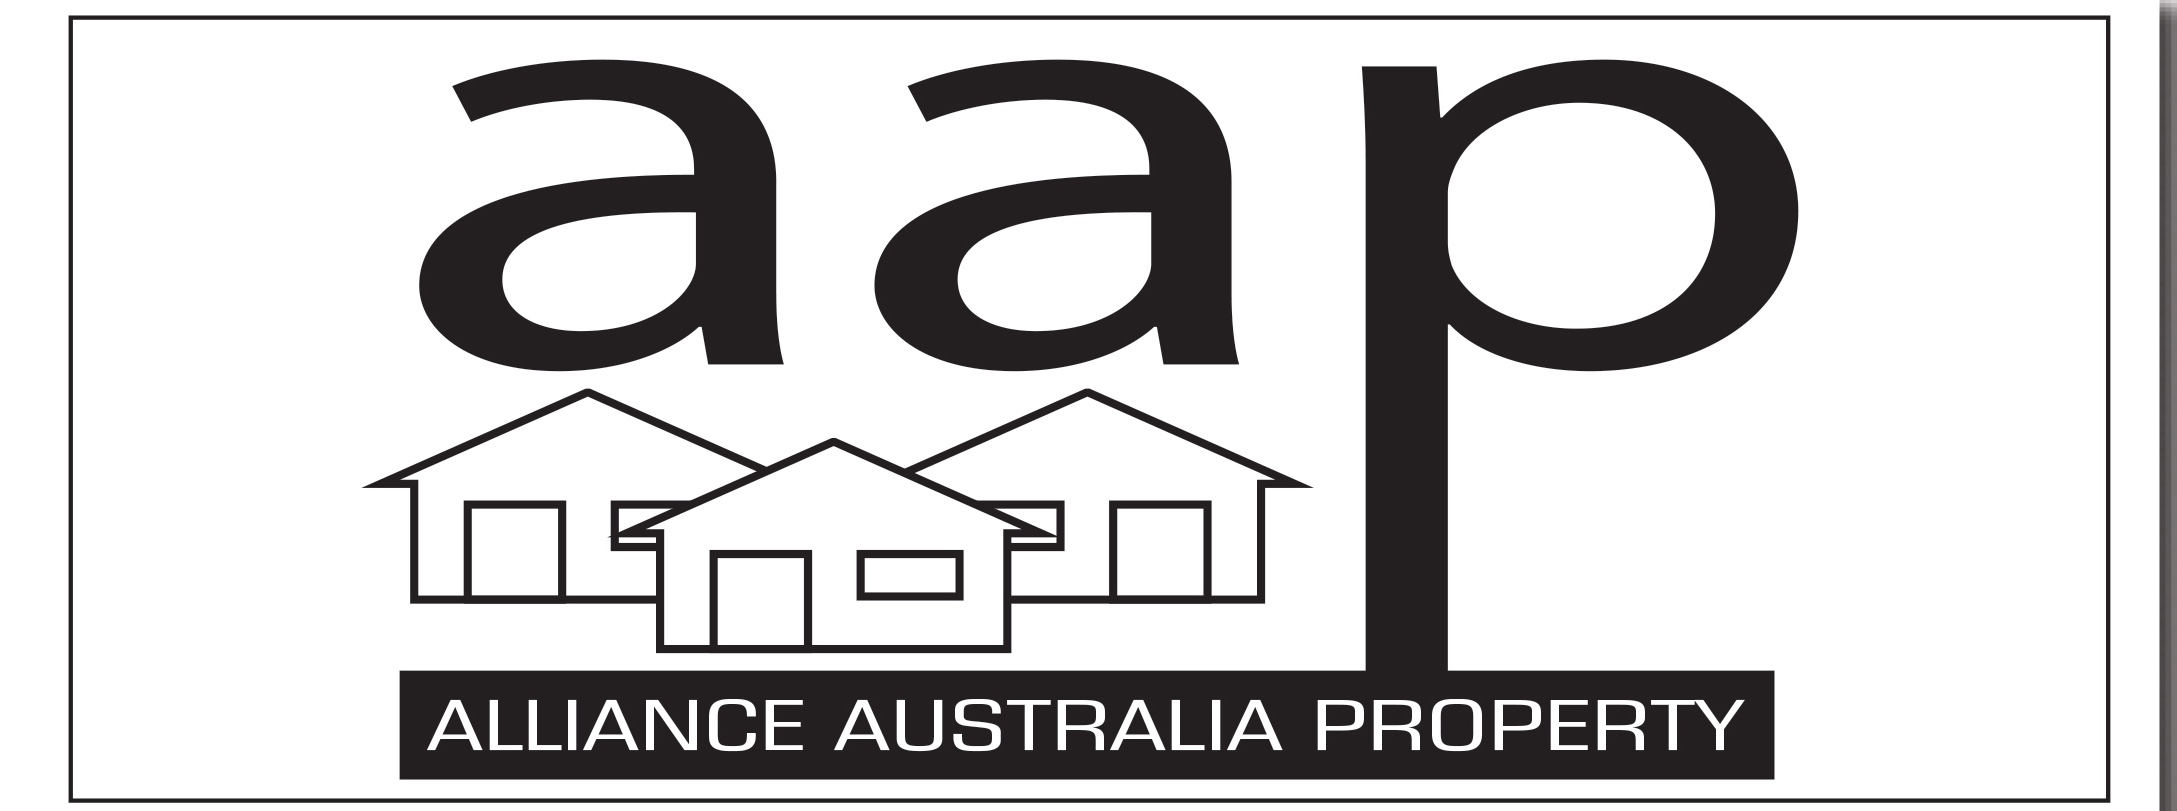 Alliance Australia Property, Campsie, 2194